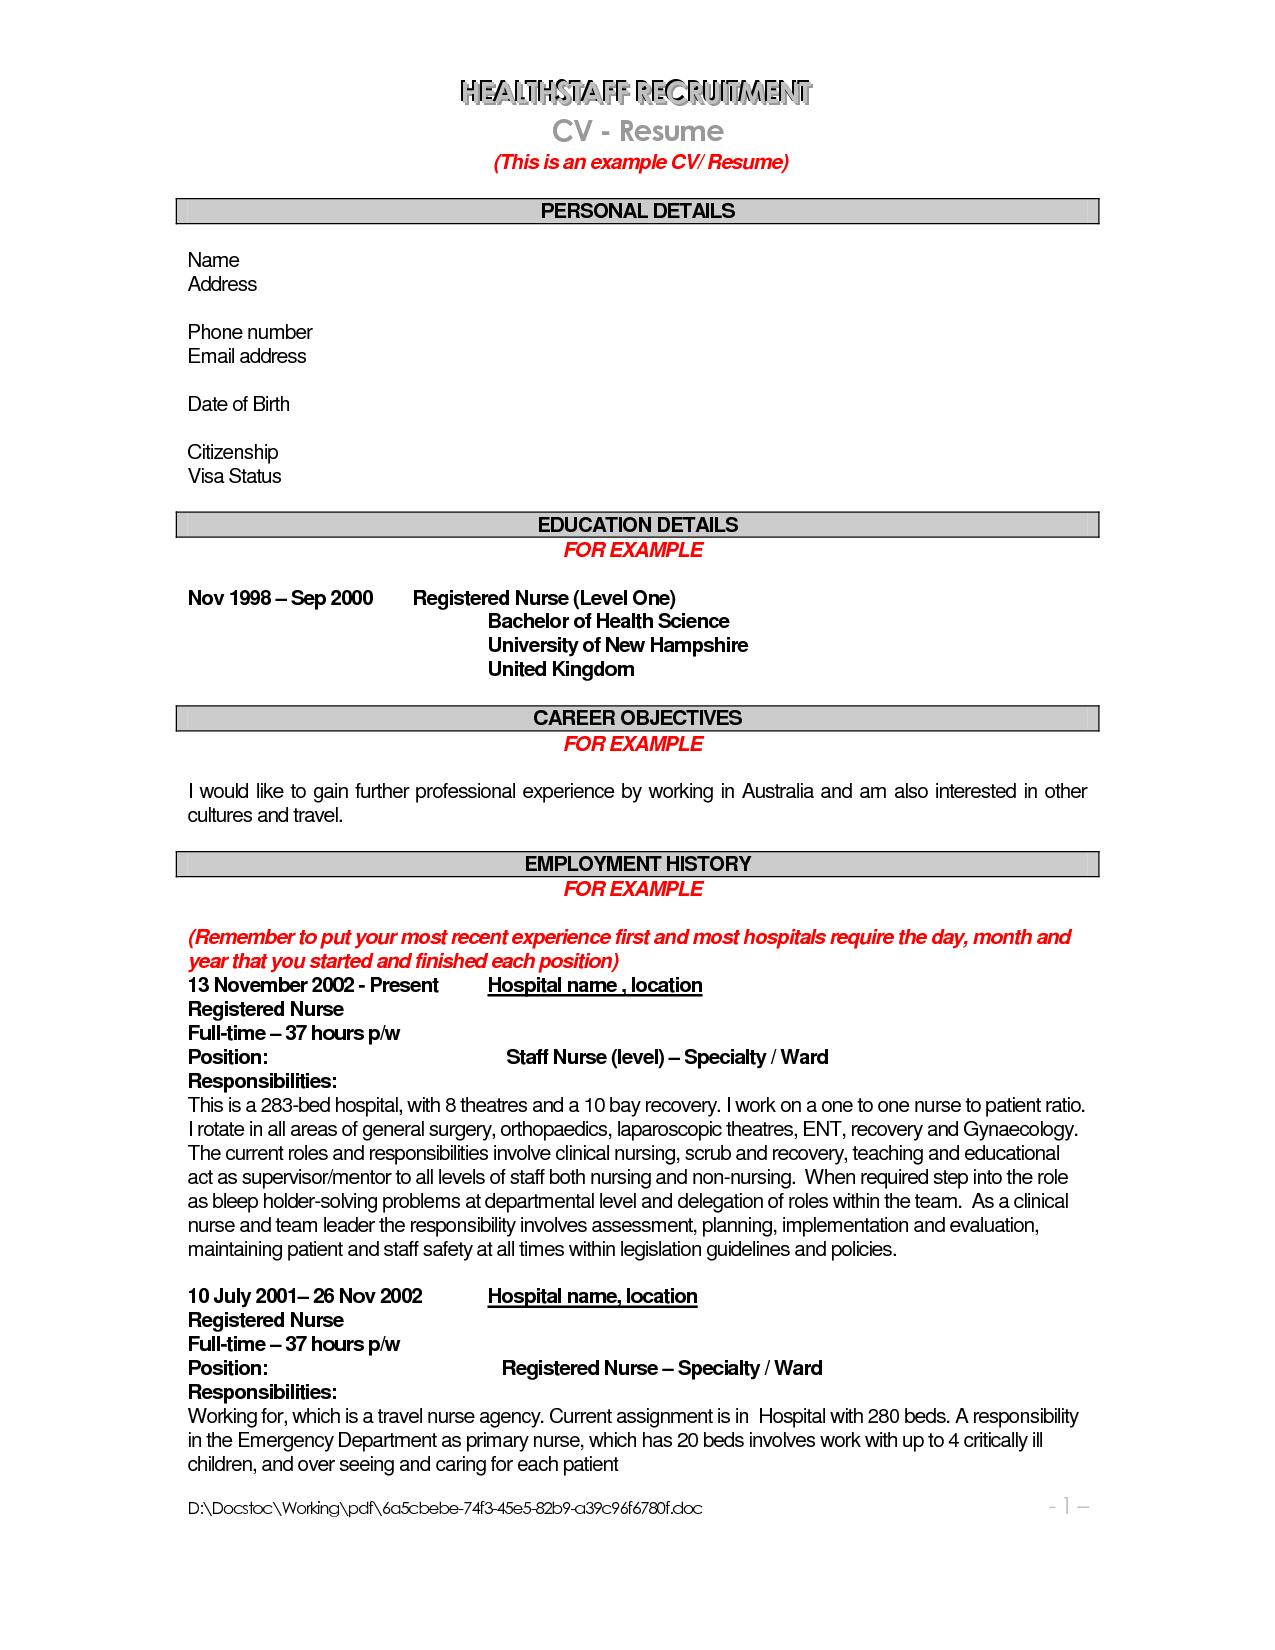 Job Descriptions 4 Resume Examples Pinterest Sample Resume